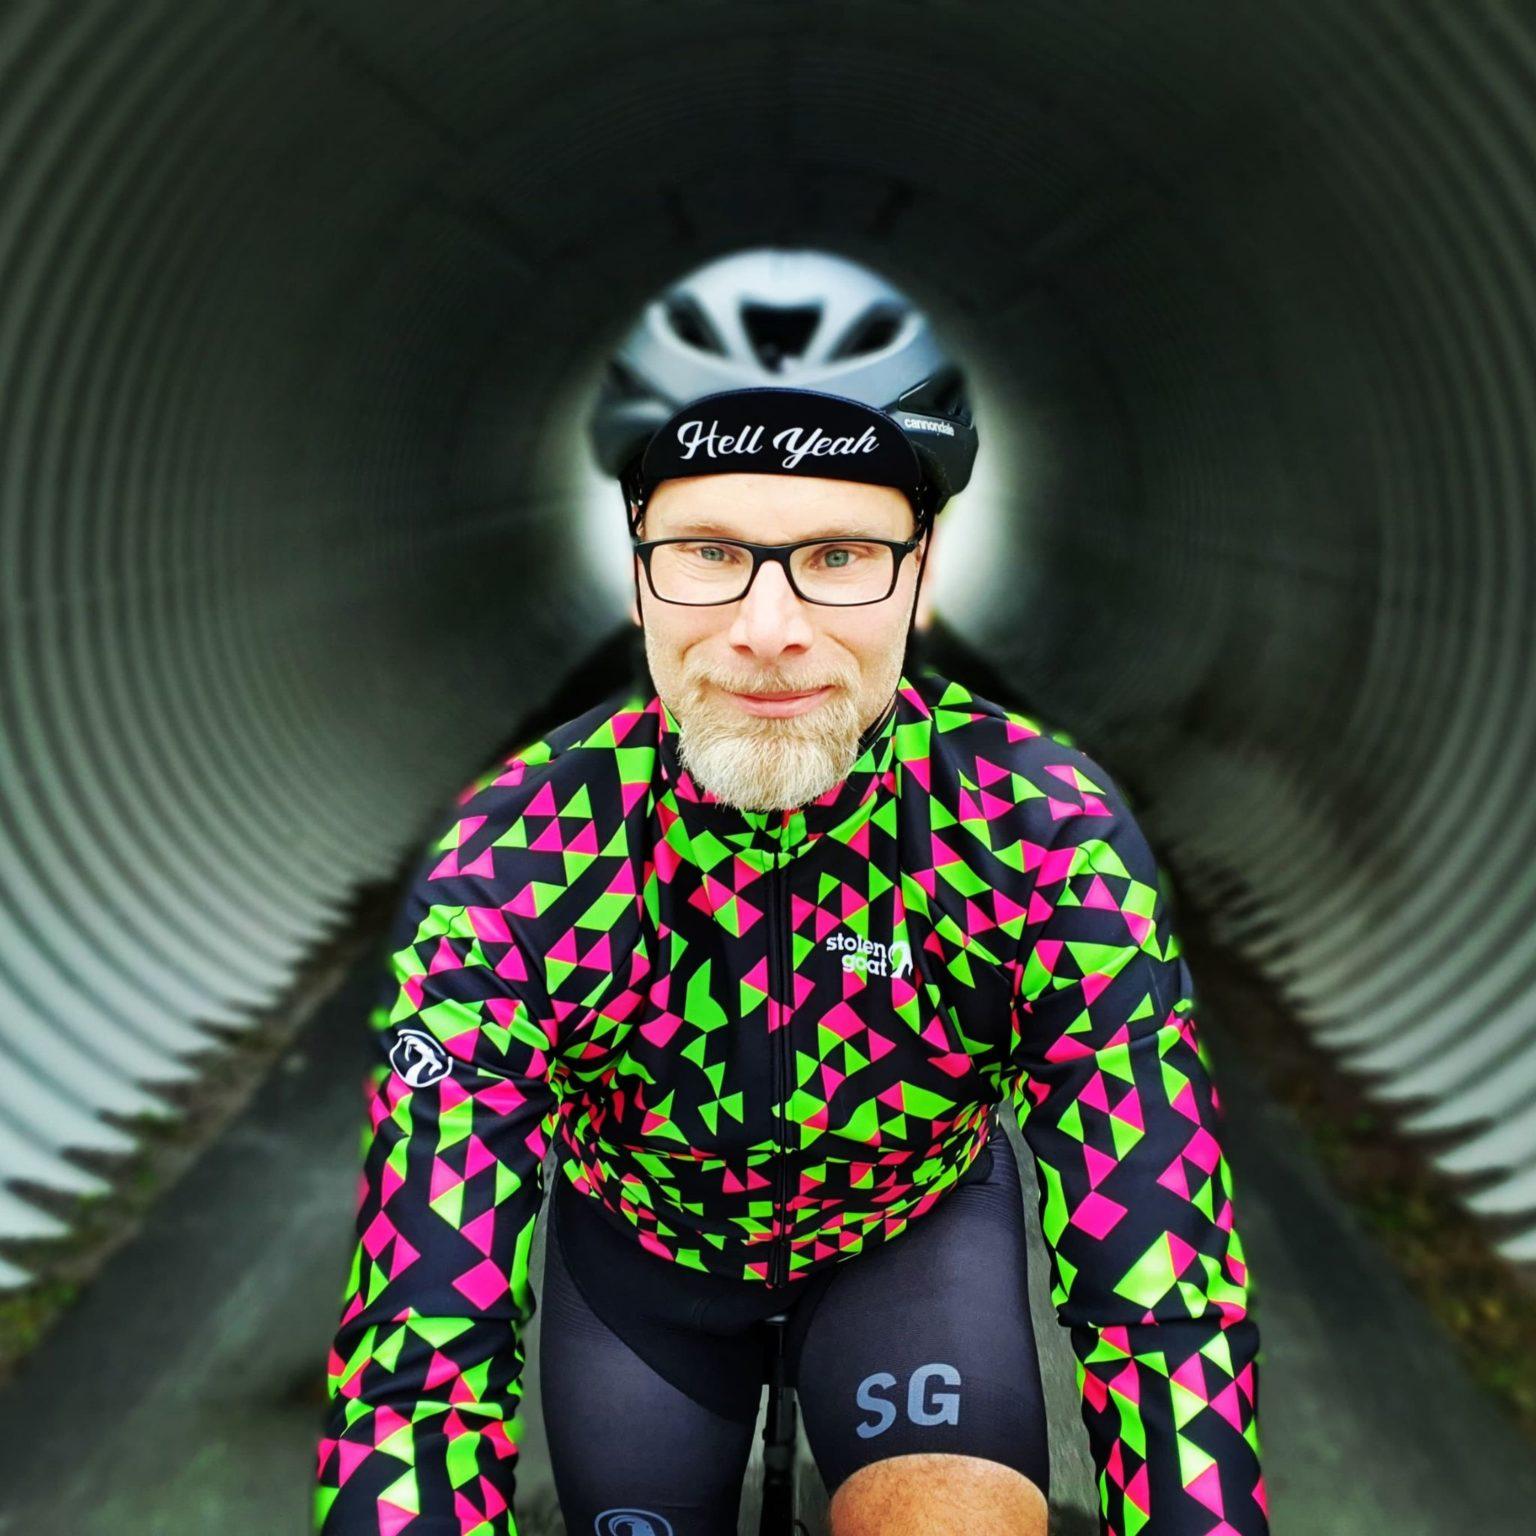 Ronny Jansson cykling